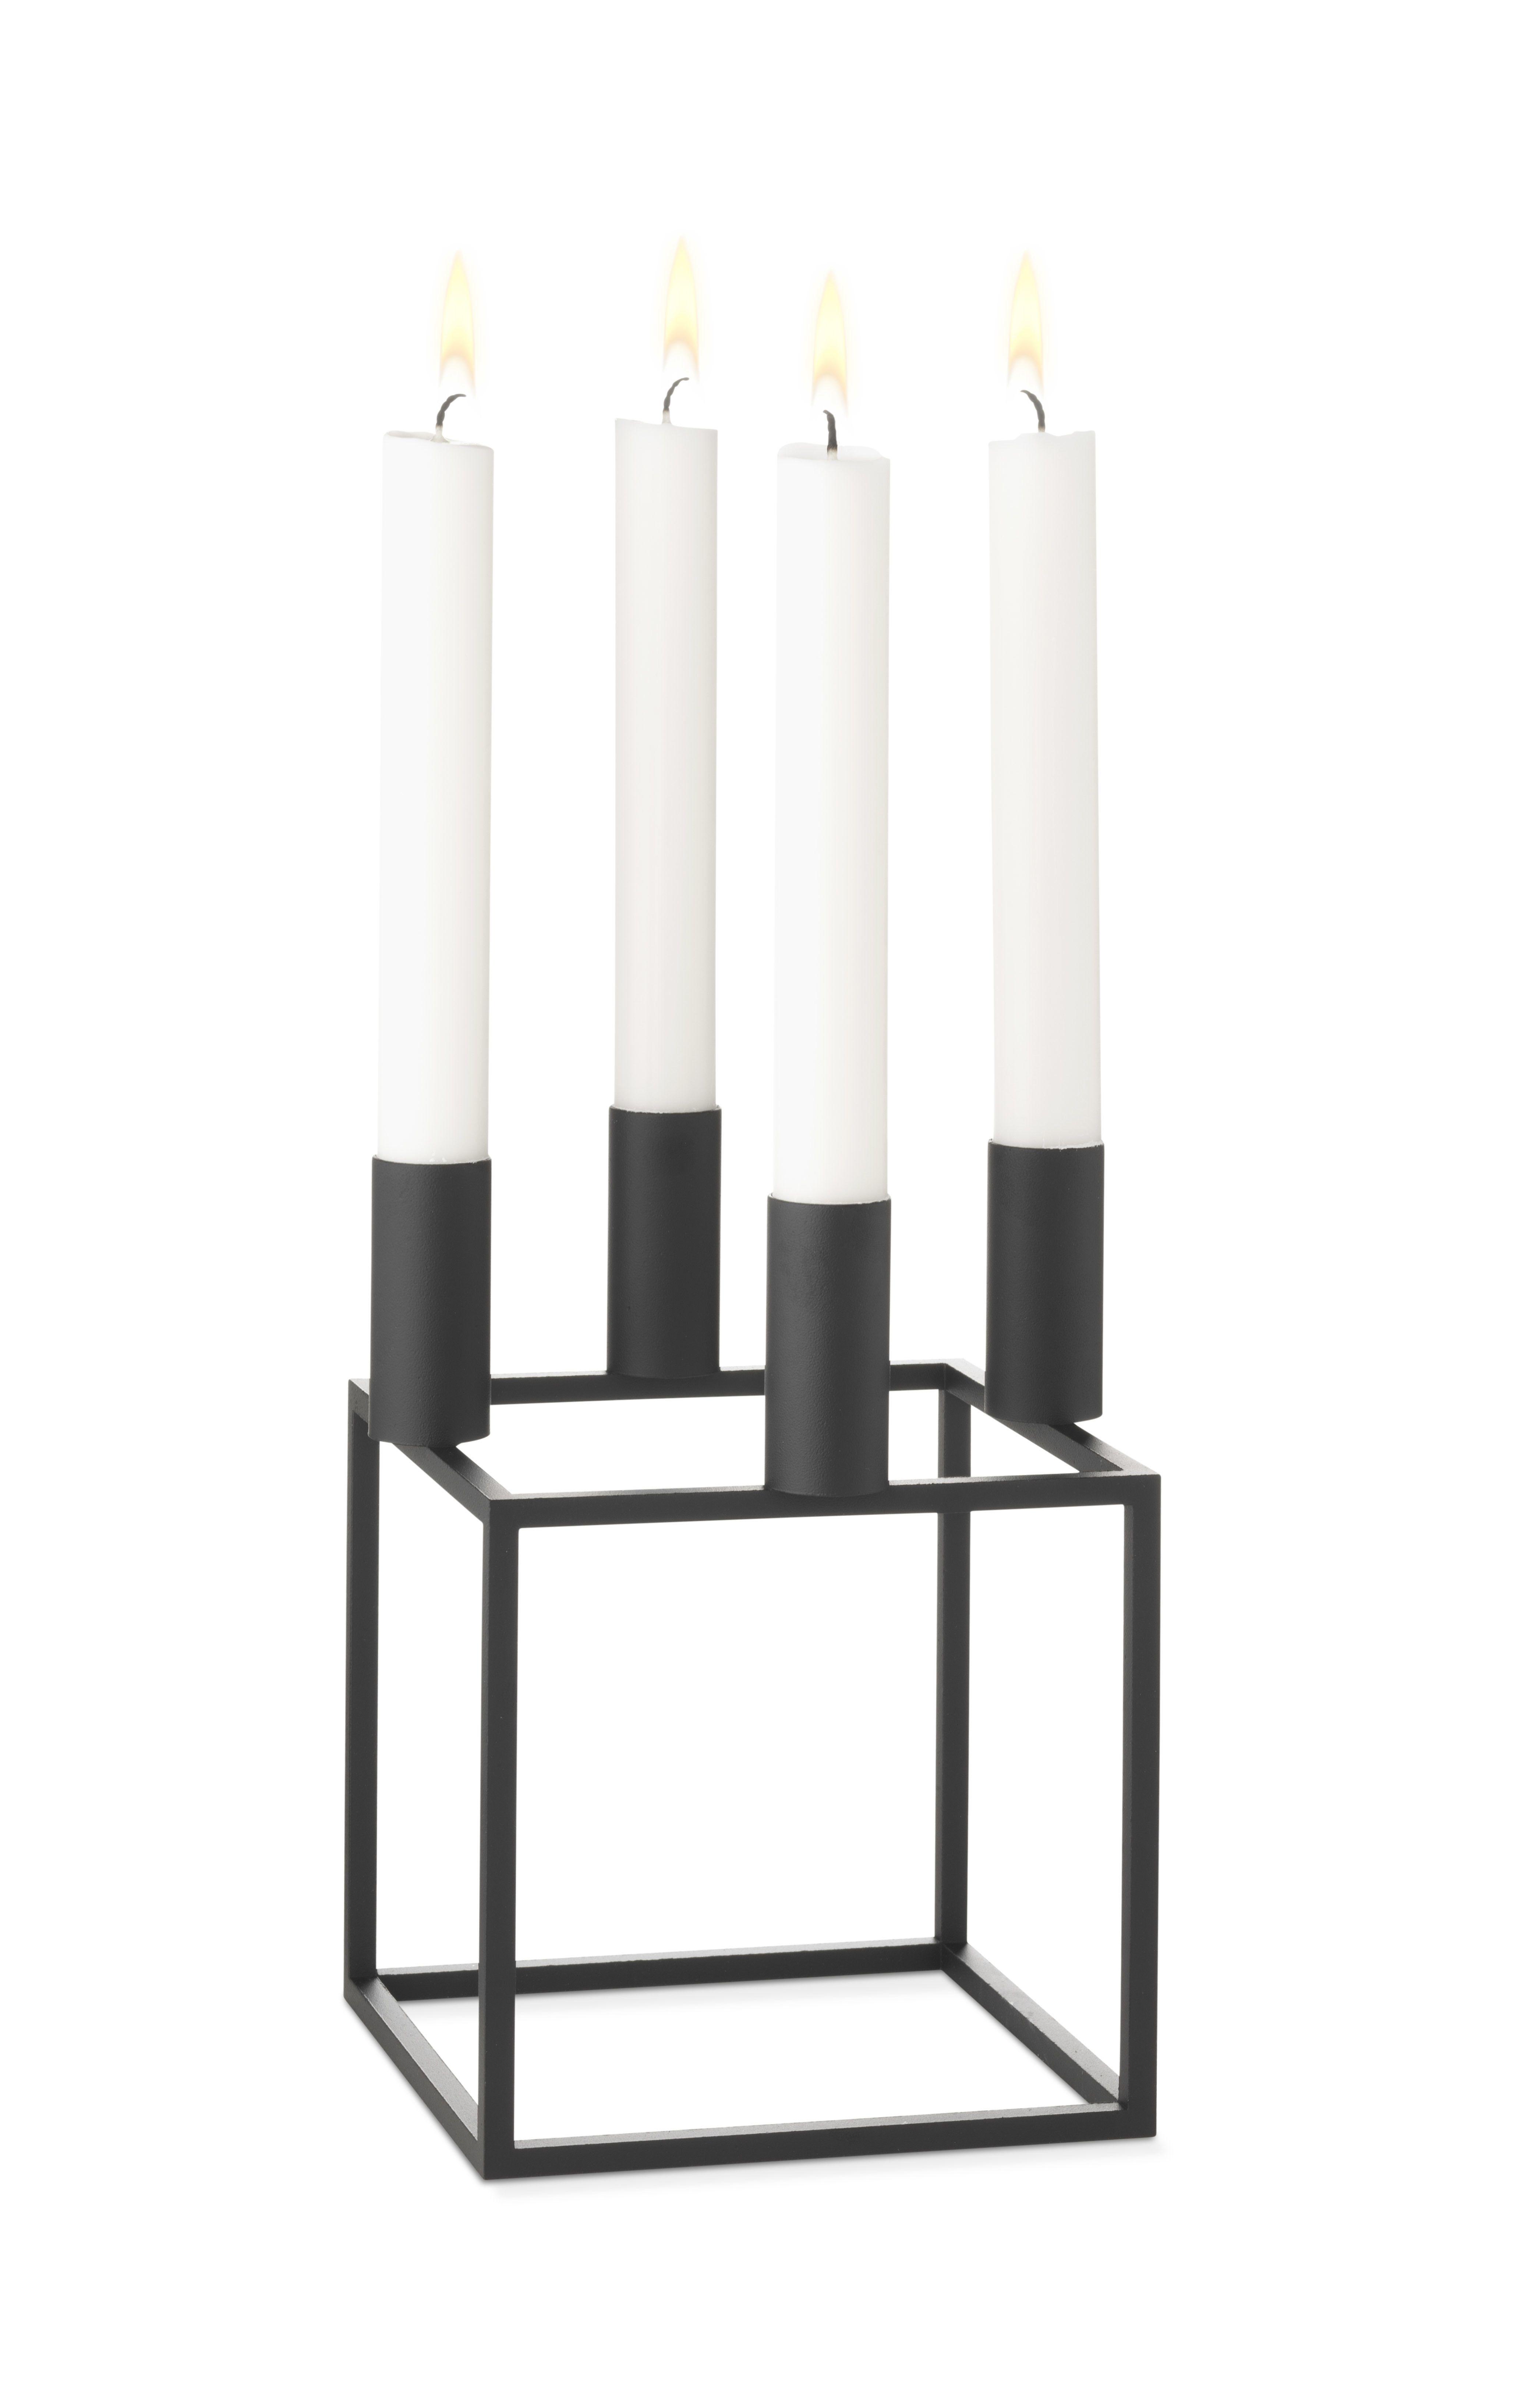 by Lassen - Kubus 4 Lysestage - Sort - Sort lysestage til fire lys